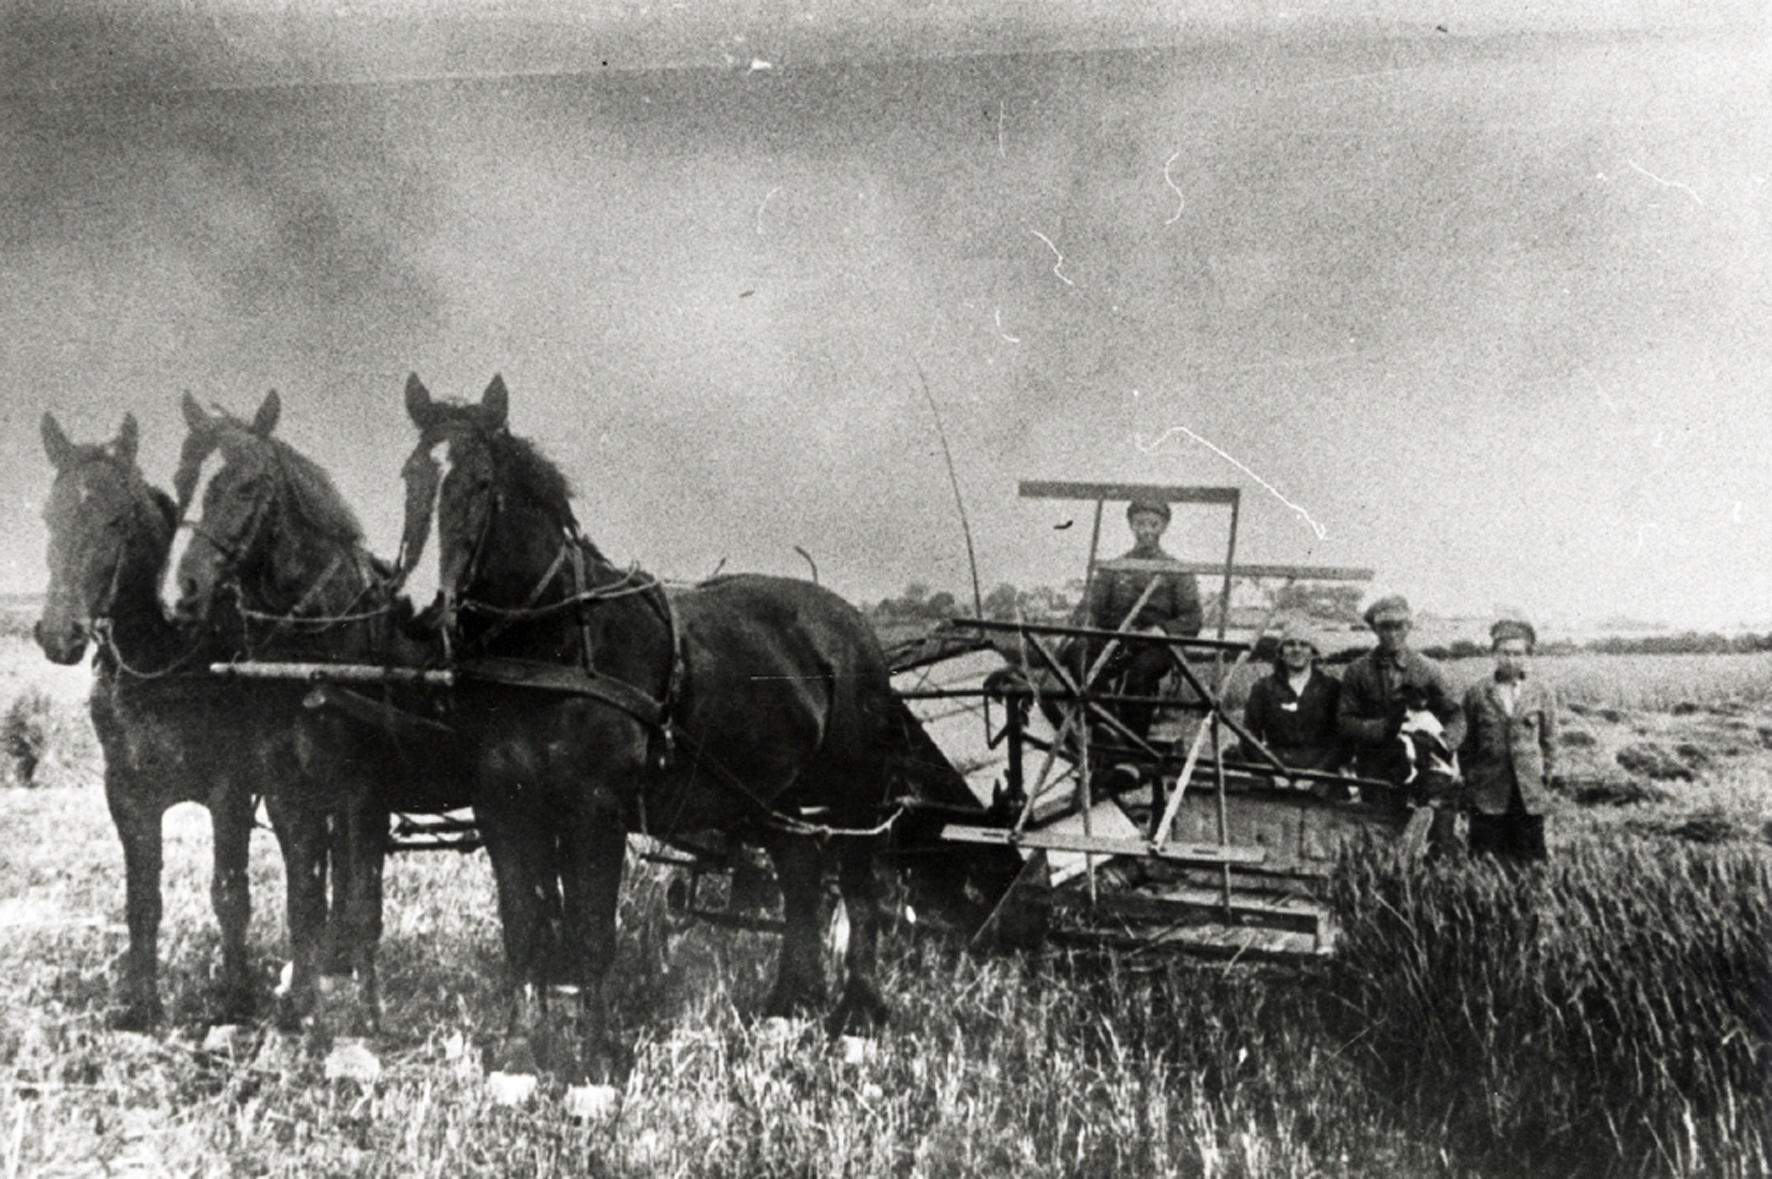 1. august 1914. Krigstilstand og mobilisering oplevet i Broager